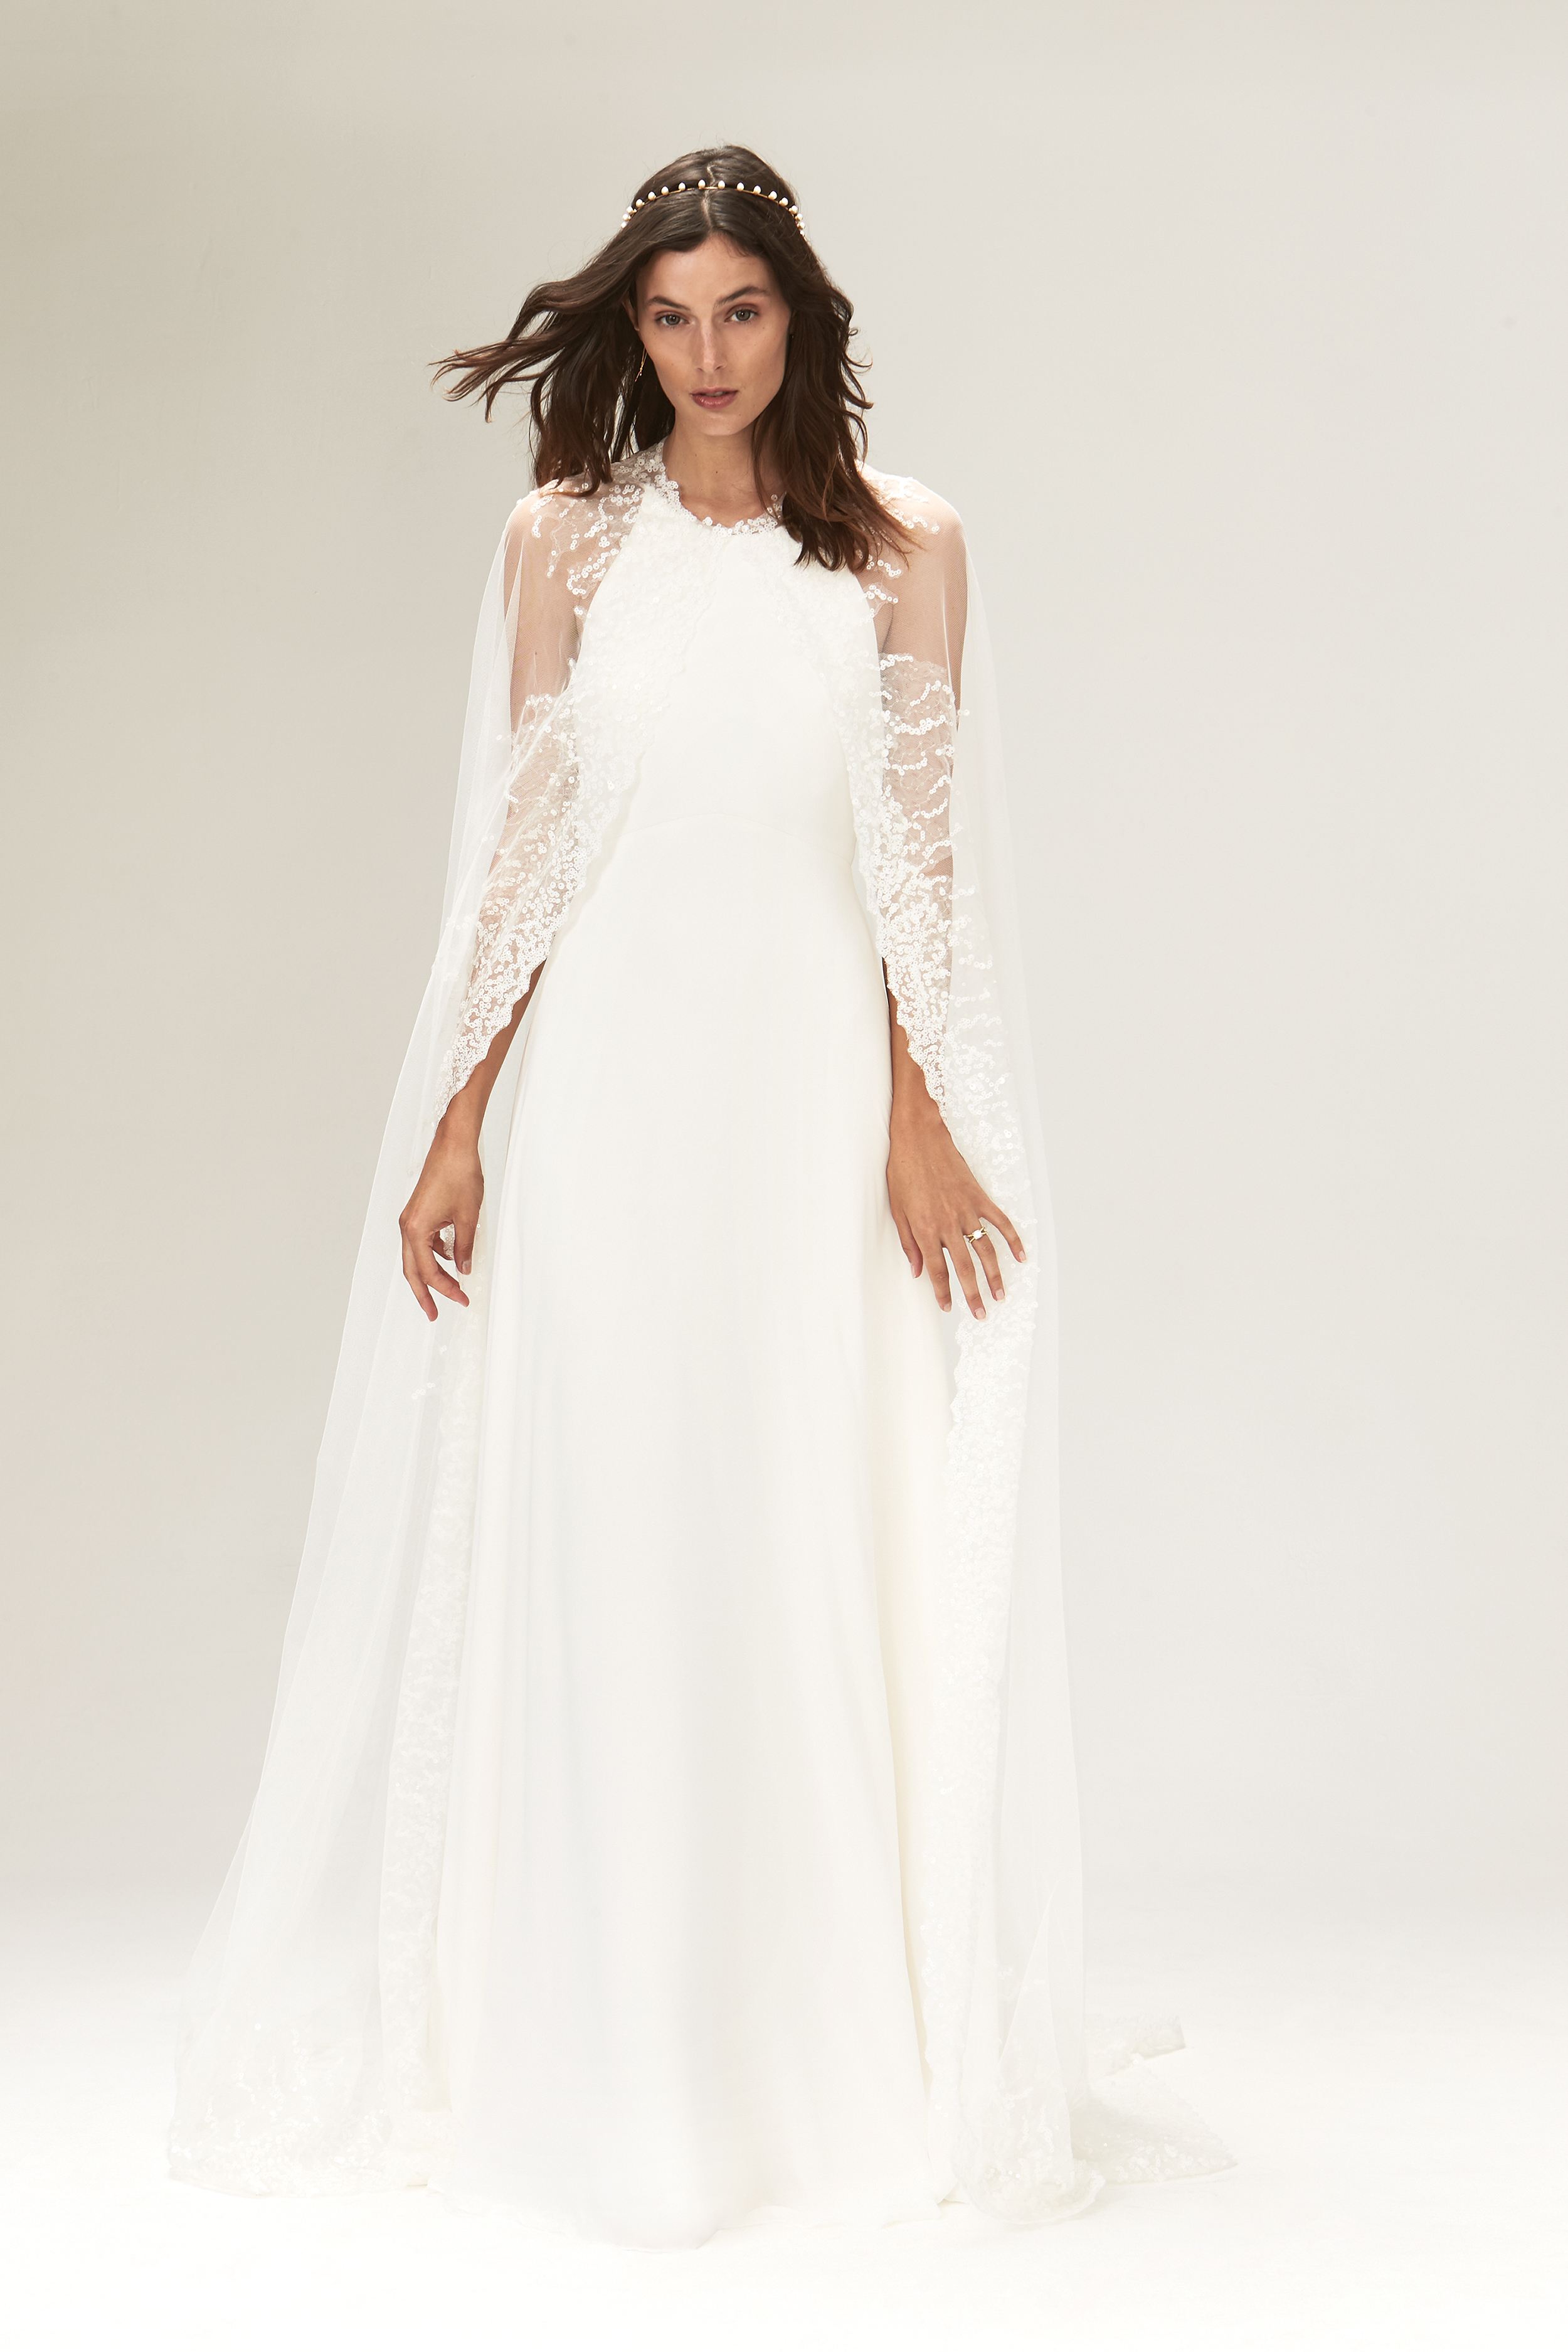 savannah miller fall 2019 a line high neck sleeveless sheer lace cape